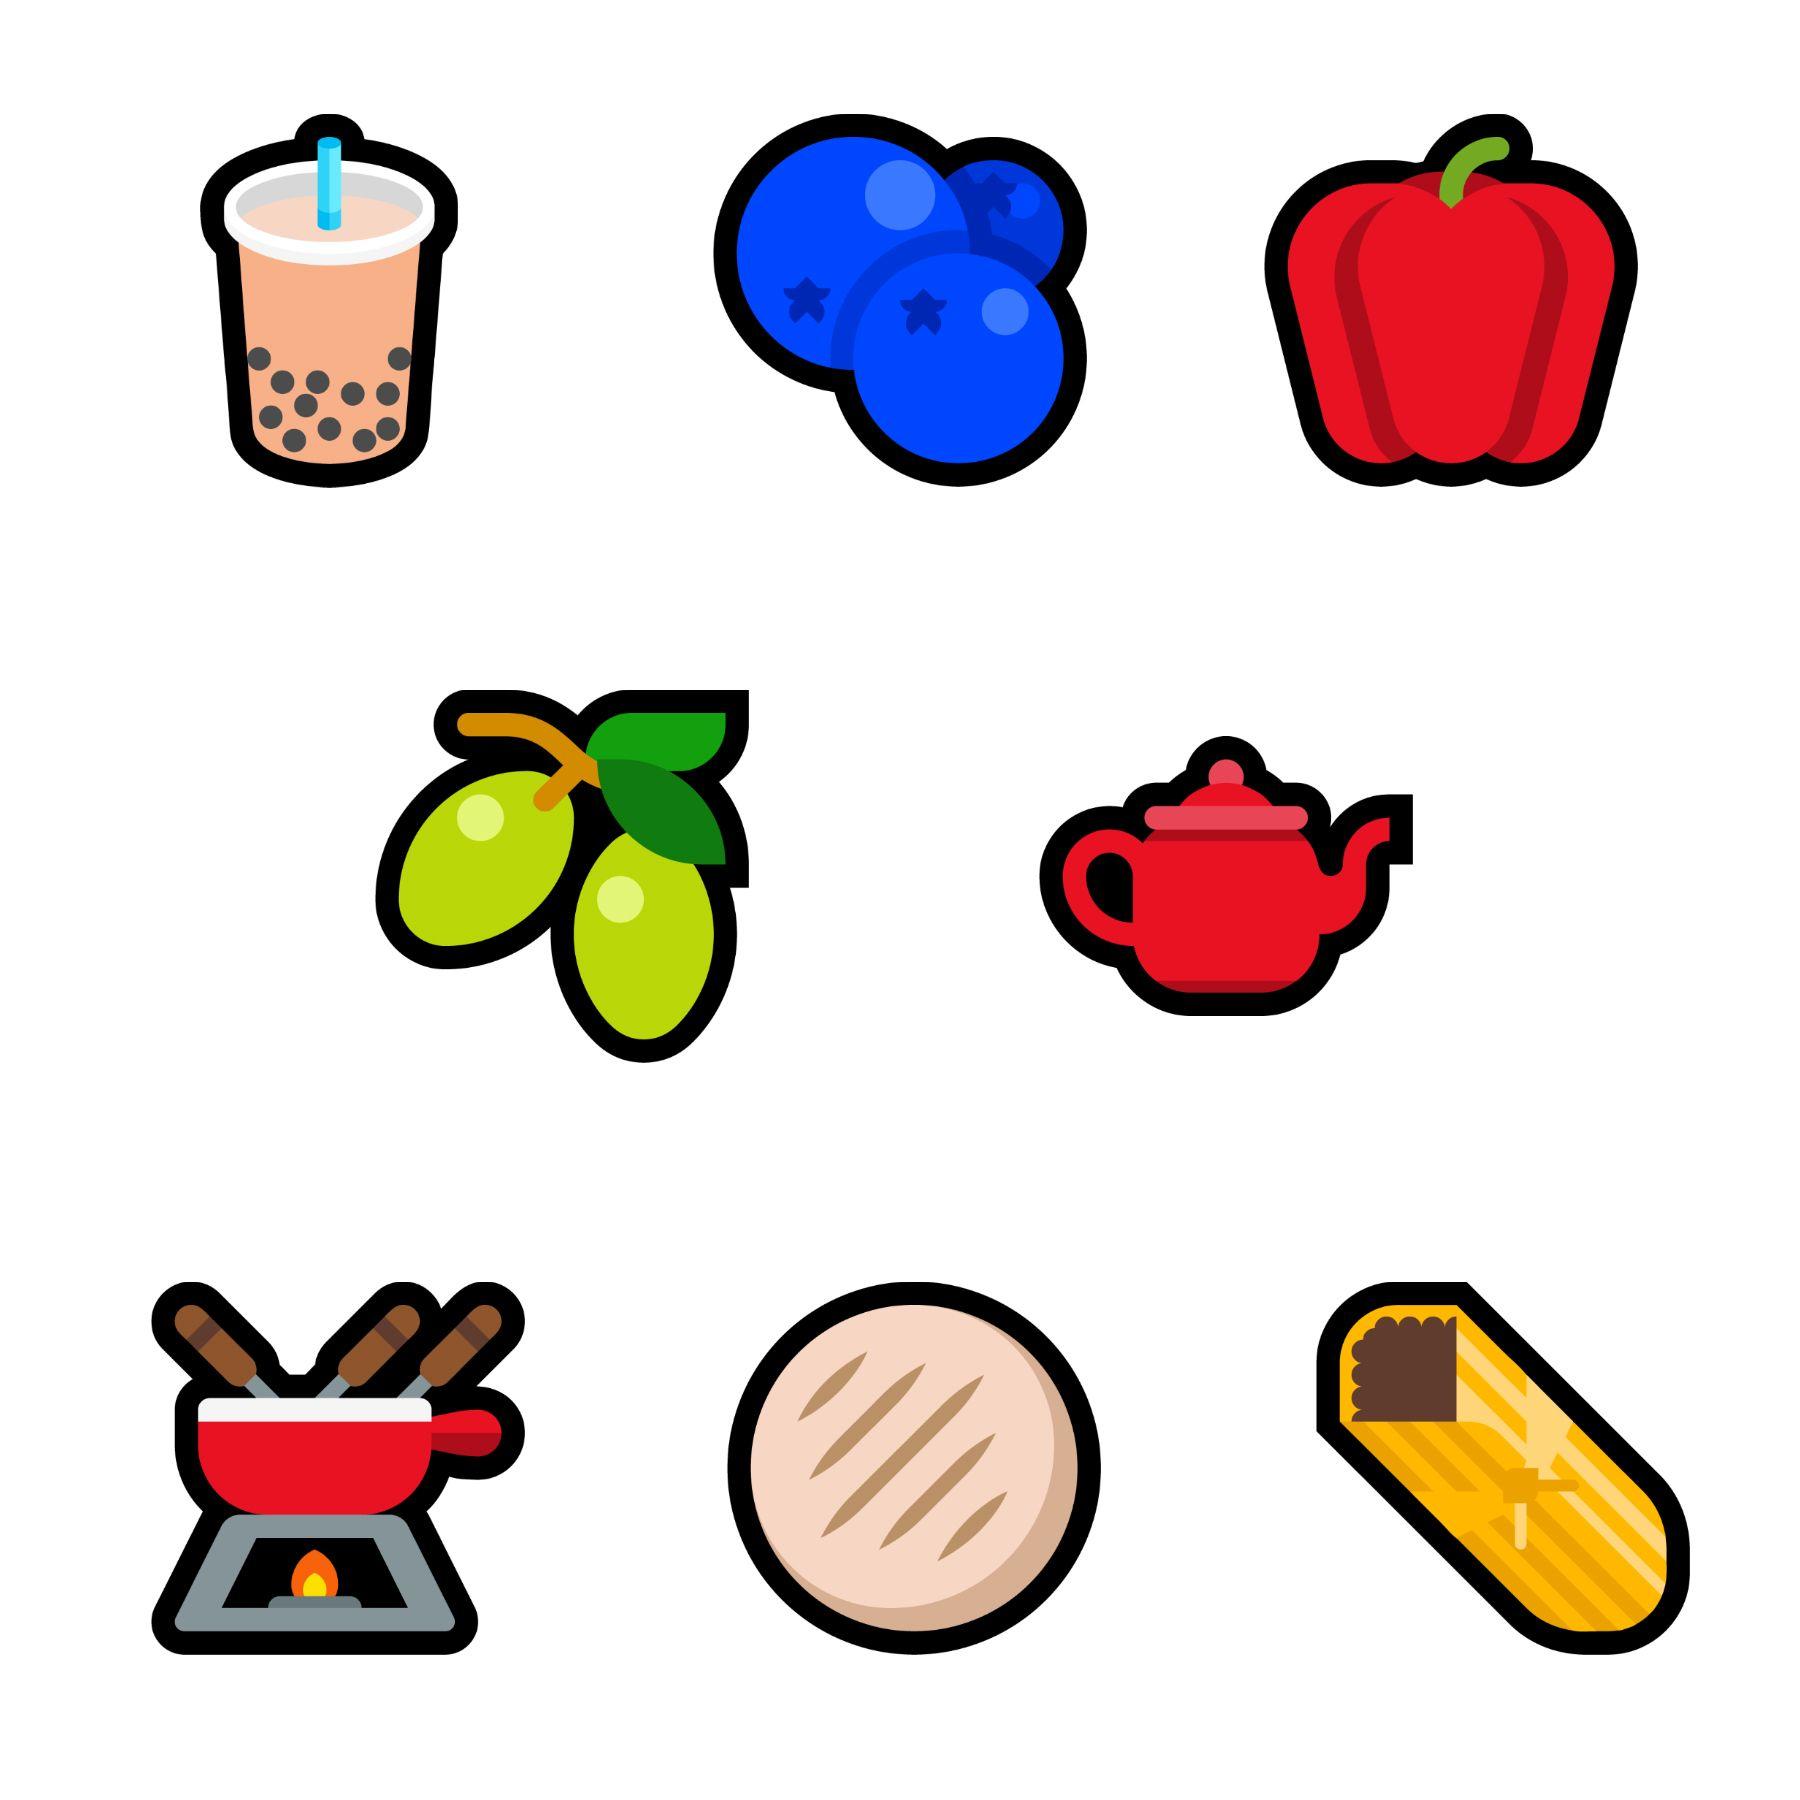 Emojipedia-Windows-11-New-Food-Emojis